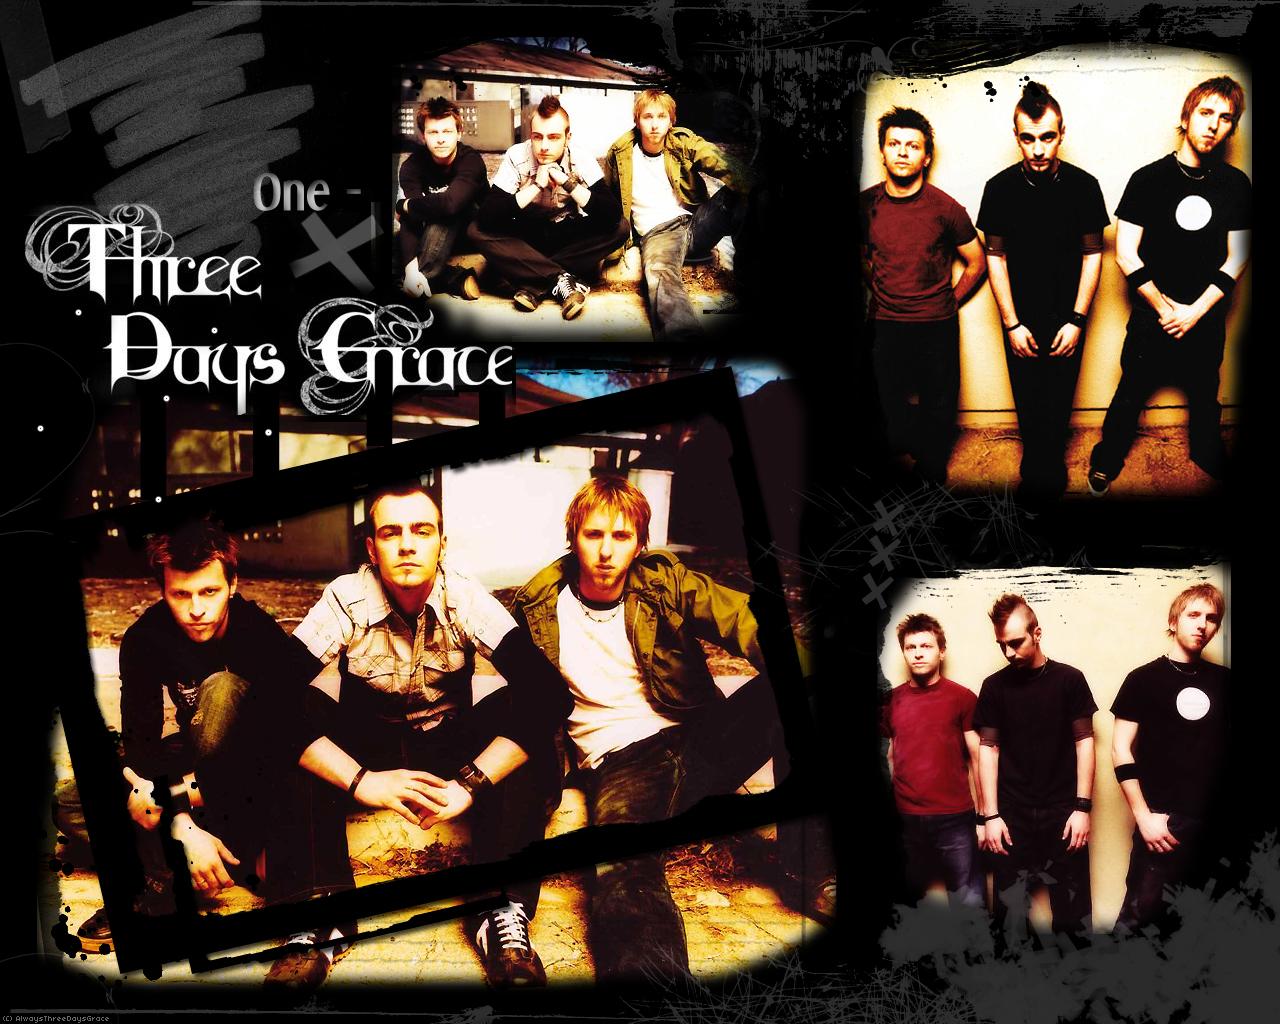 Three days grace riot - 59335